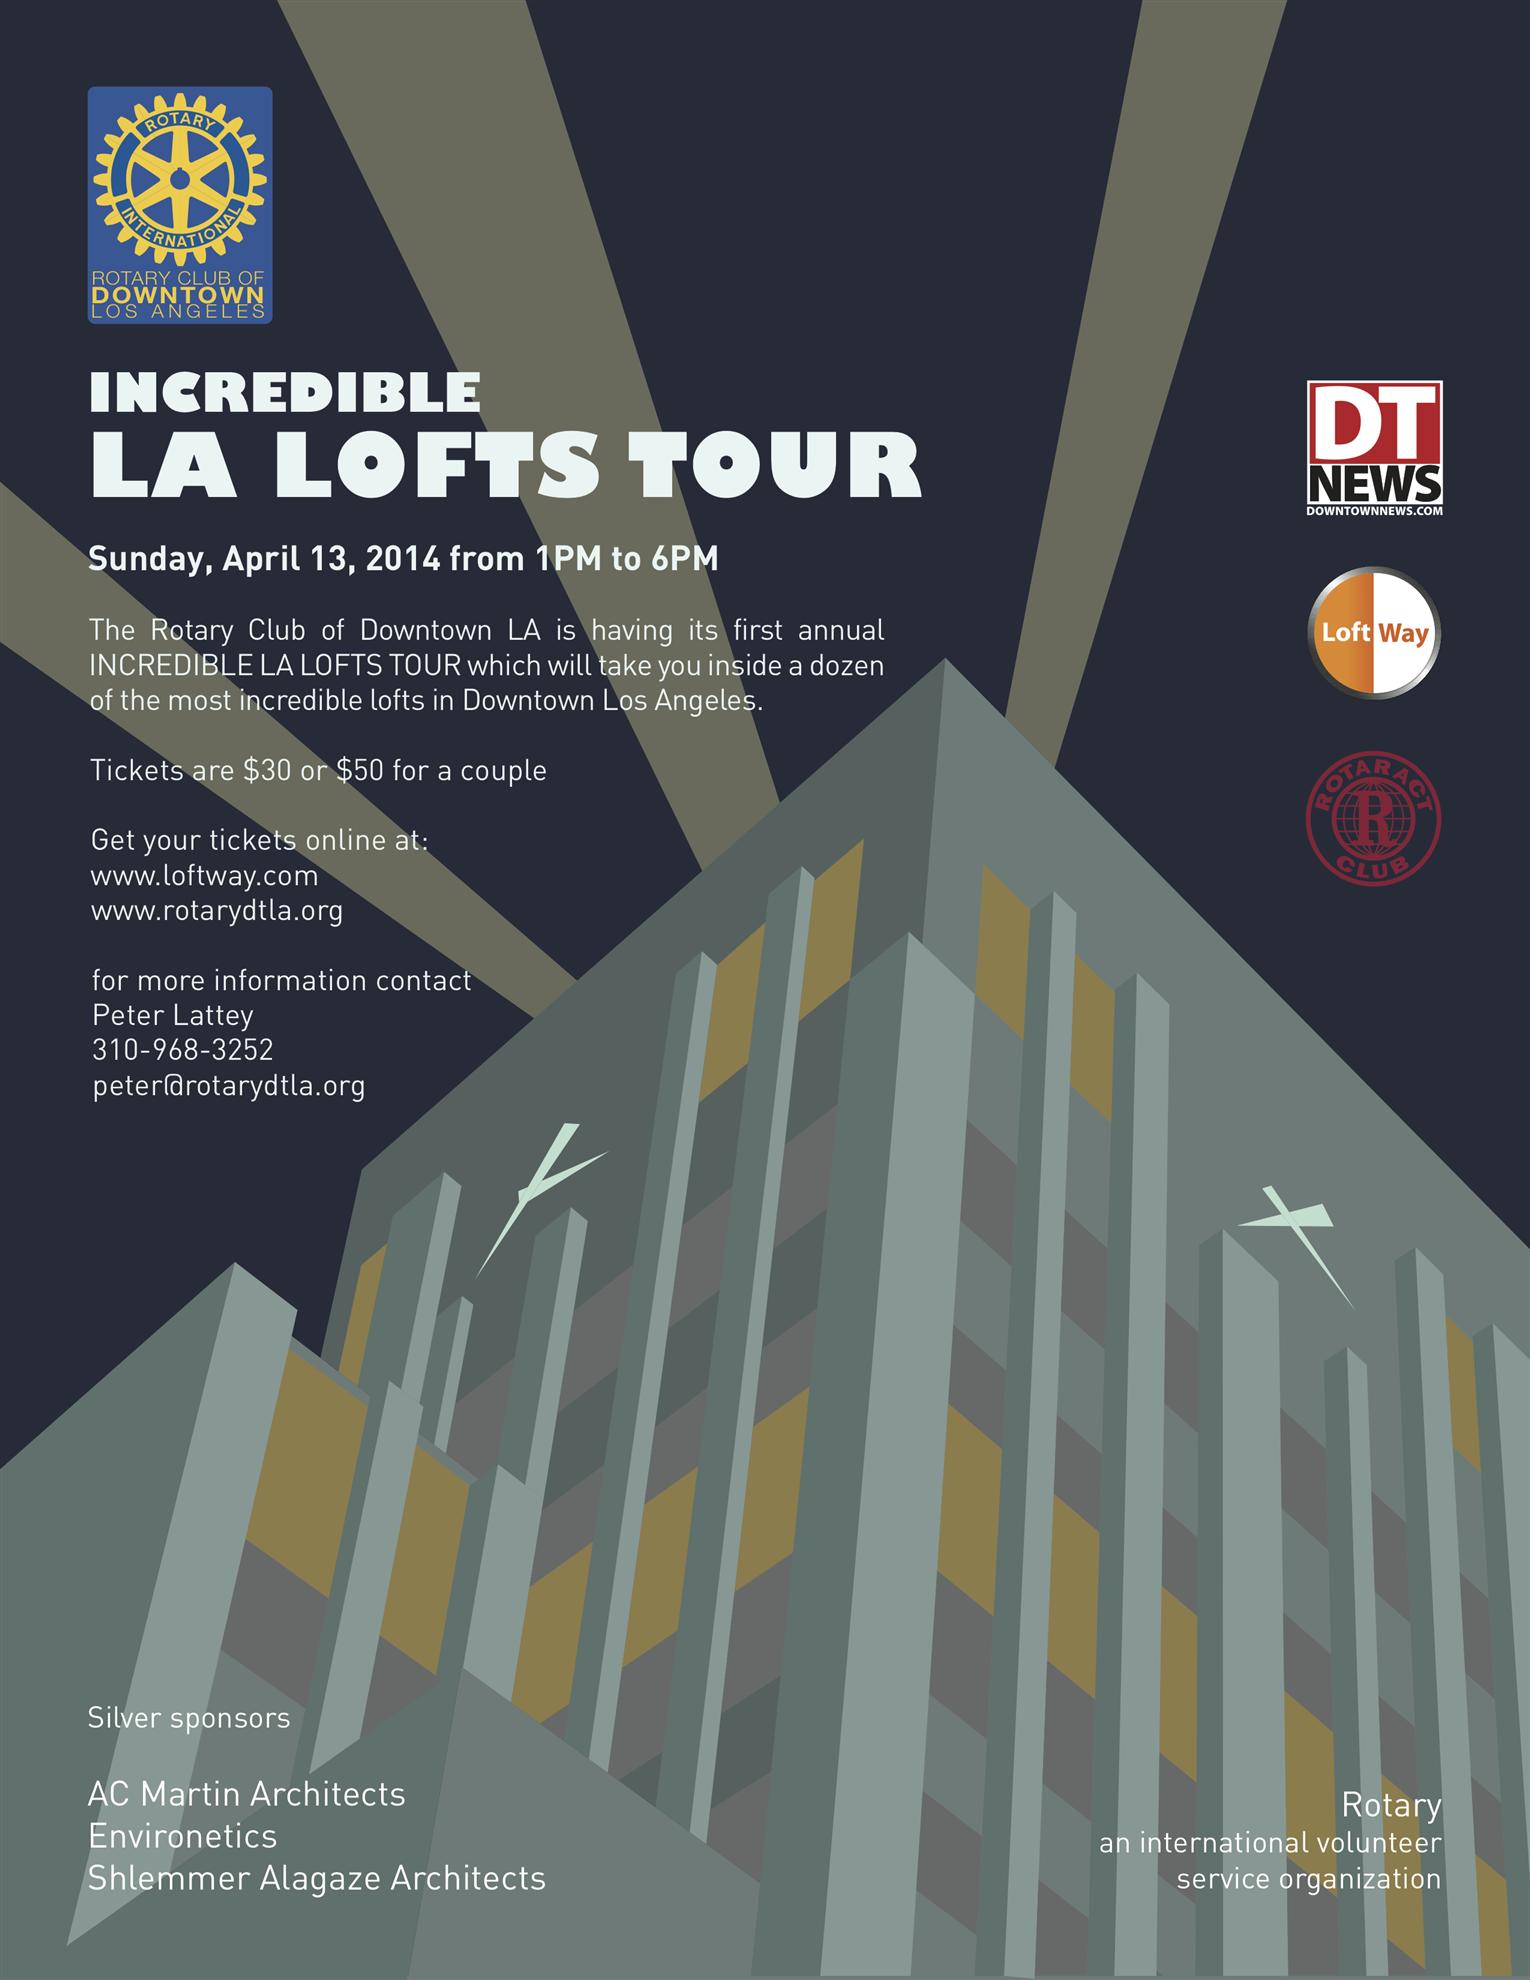 Incredible LA Lofts Tour flyer